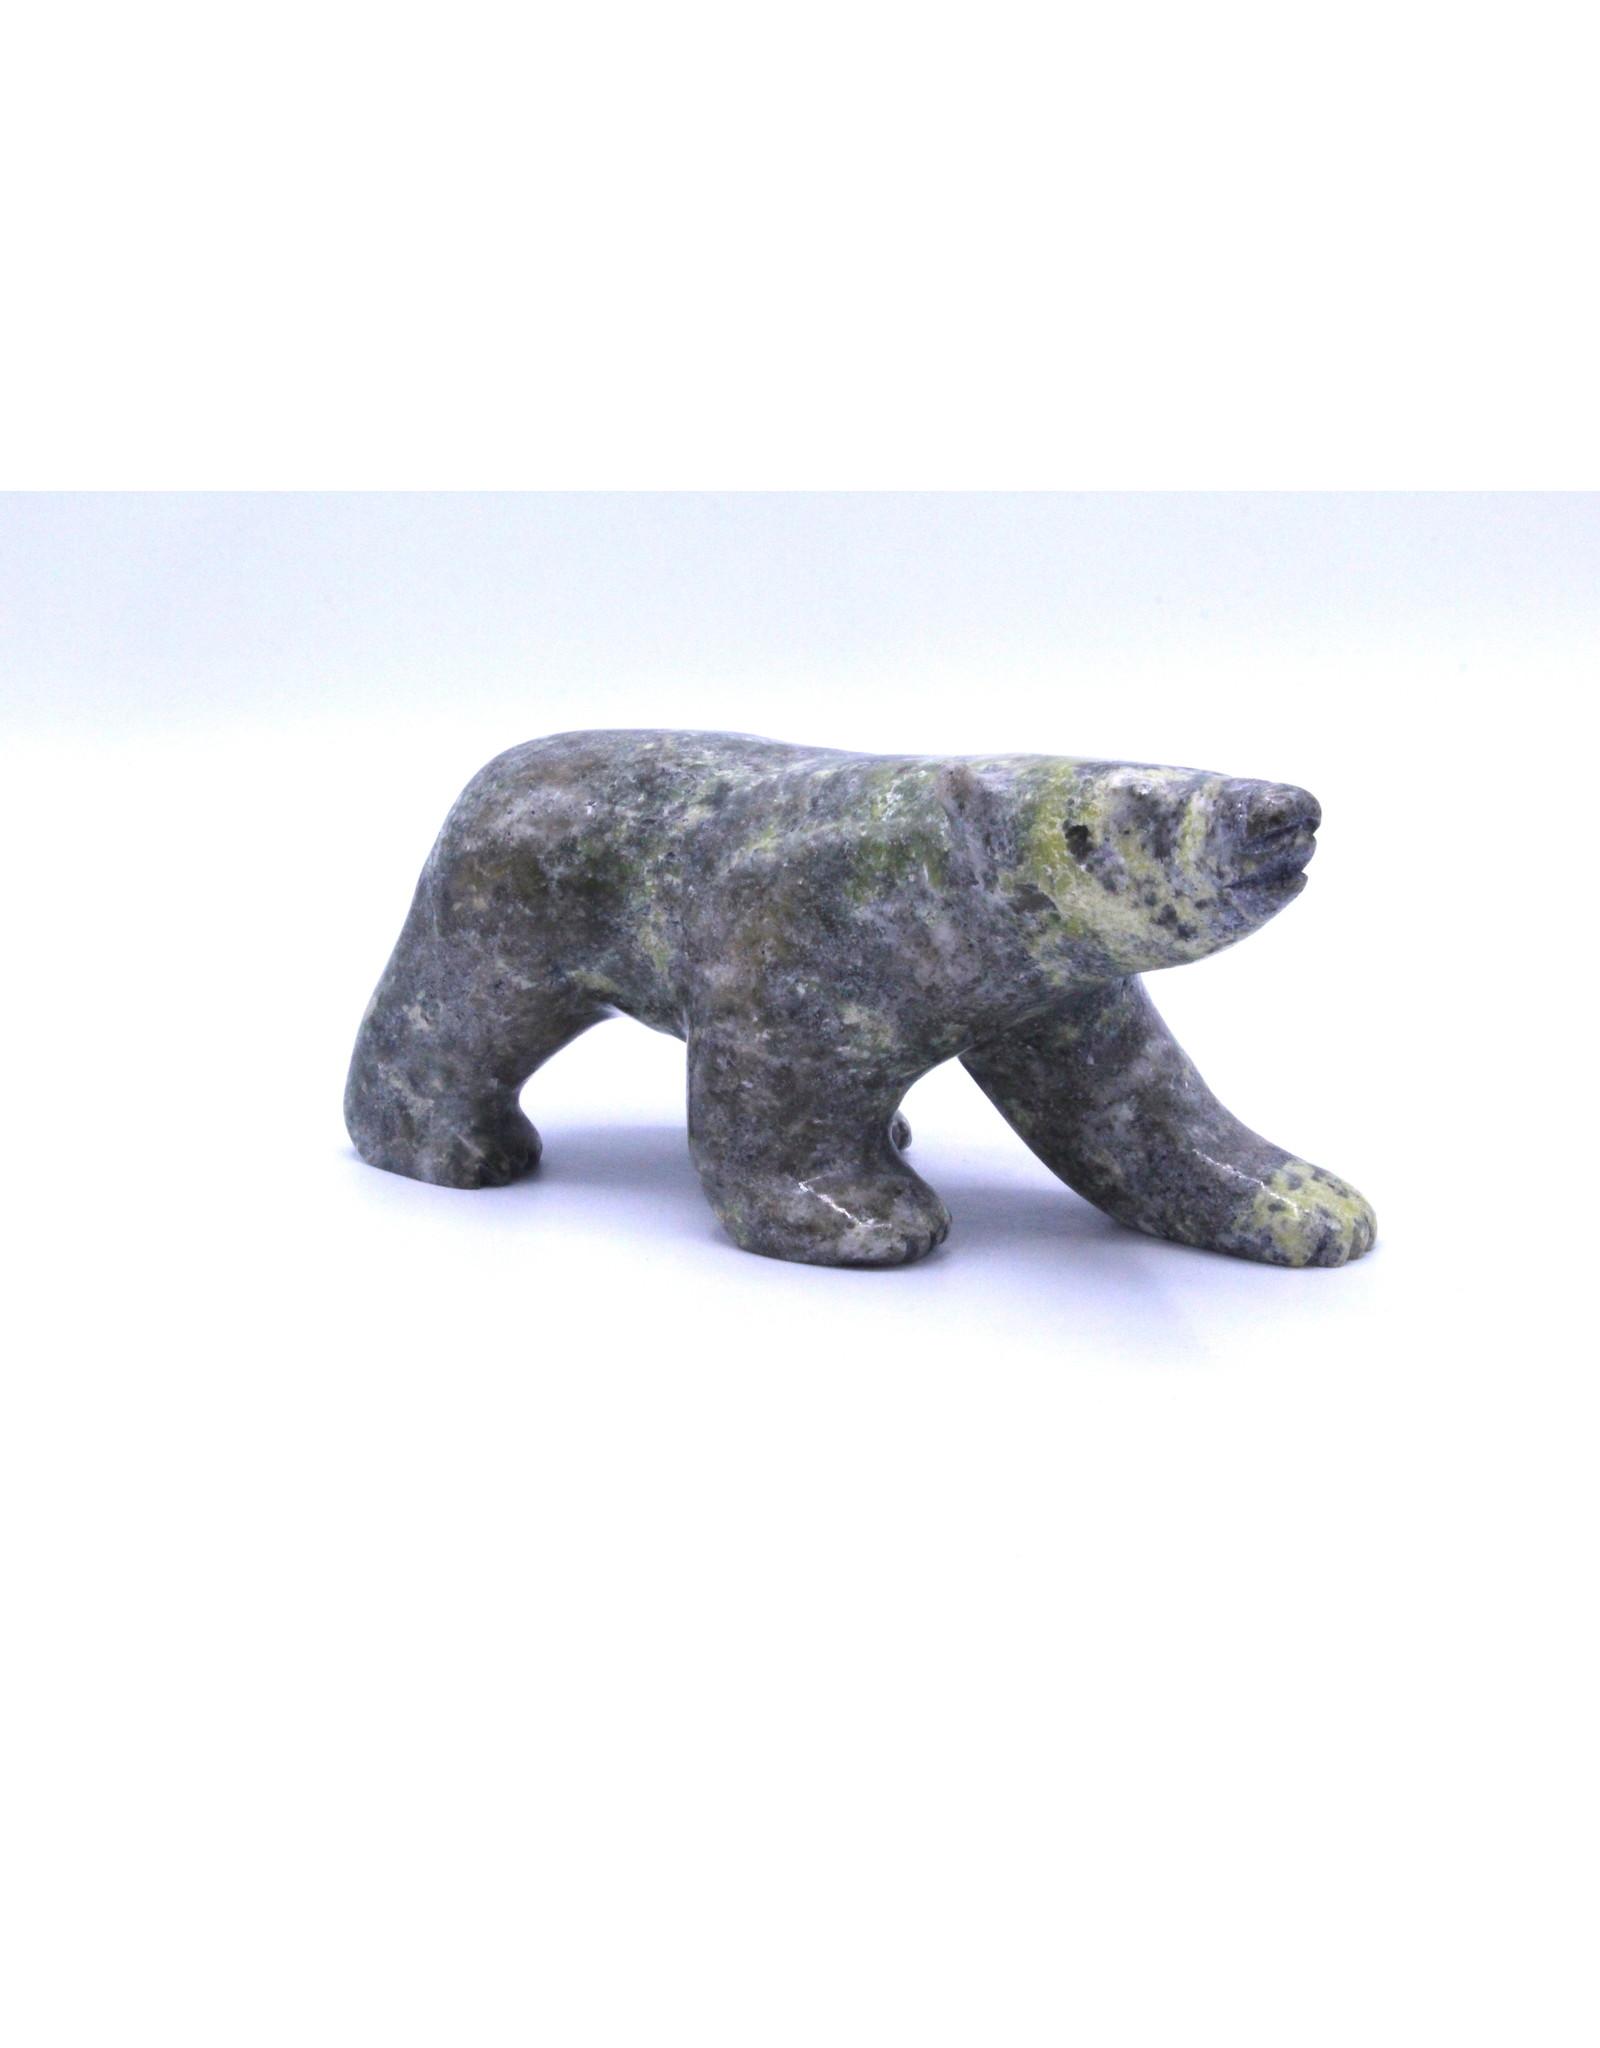 Bear by Allan Shutiapik - 62495